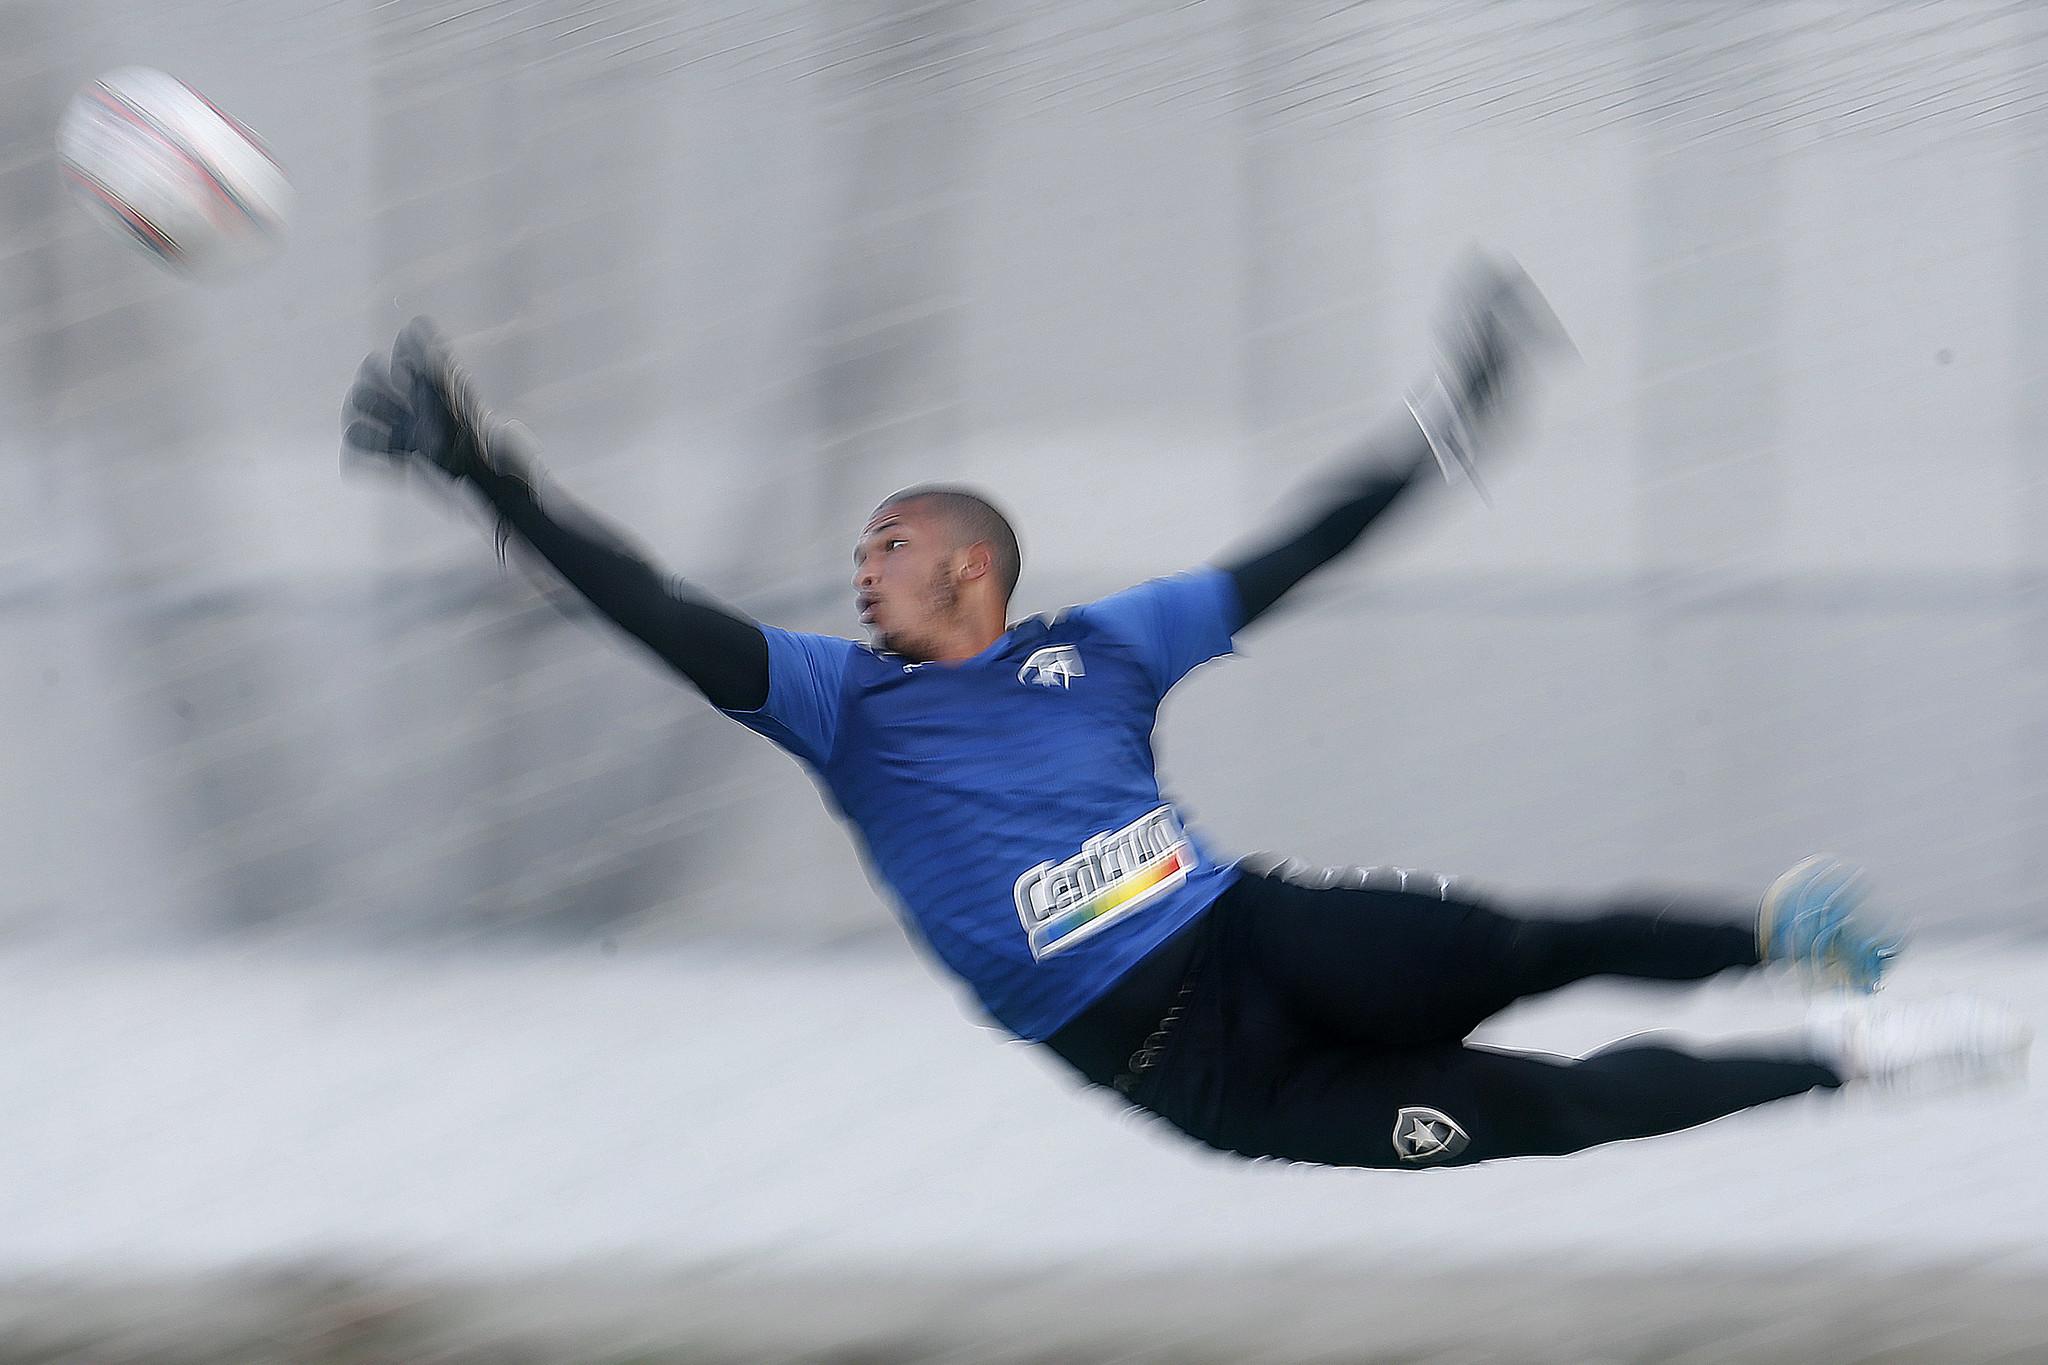 Diego Loureiro - Treino do Botafogo